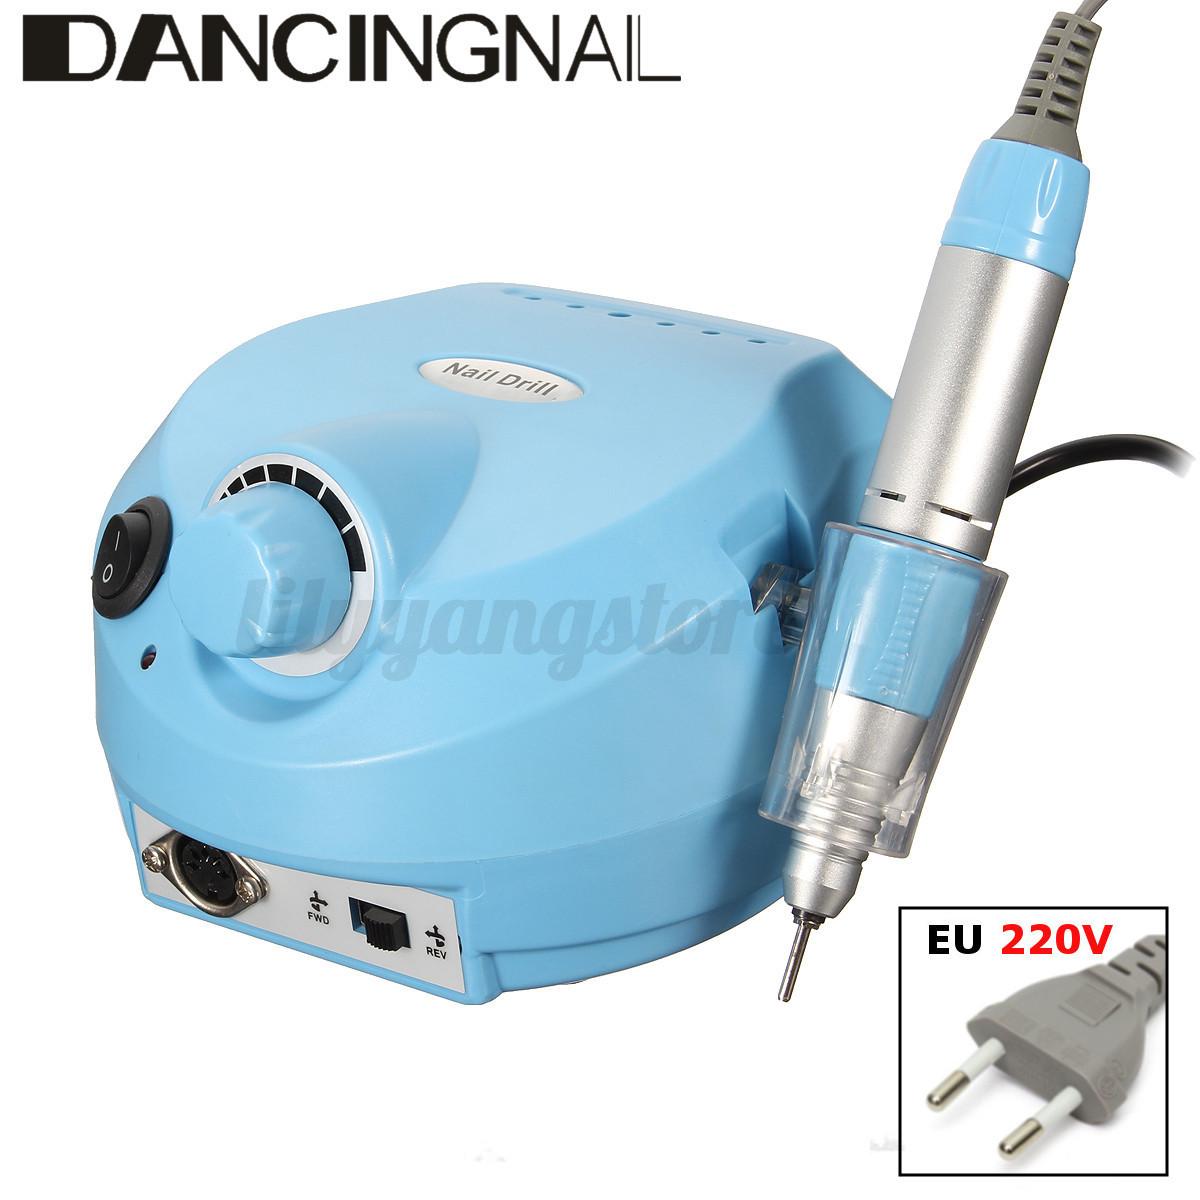 30000RPM Pro Electric Manicure Nail Art Machine Tool